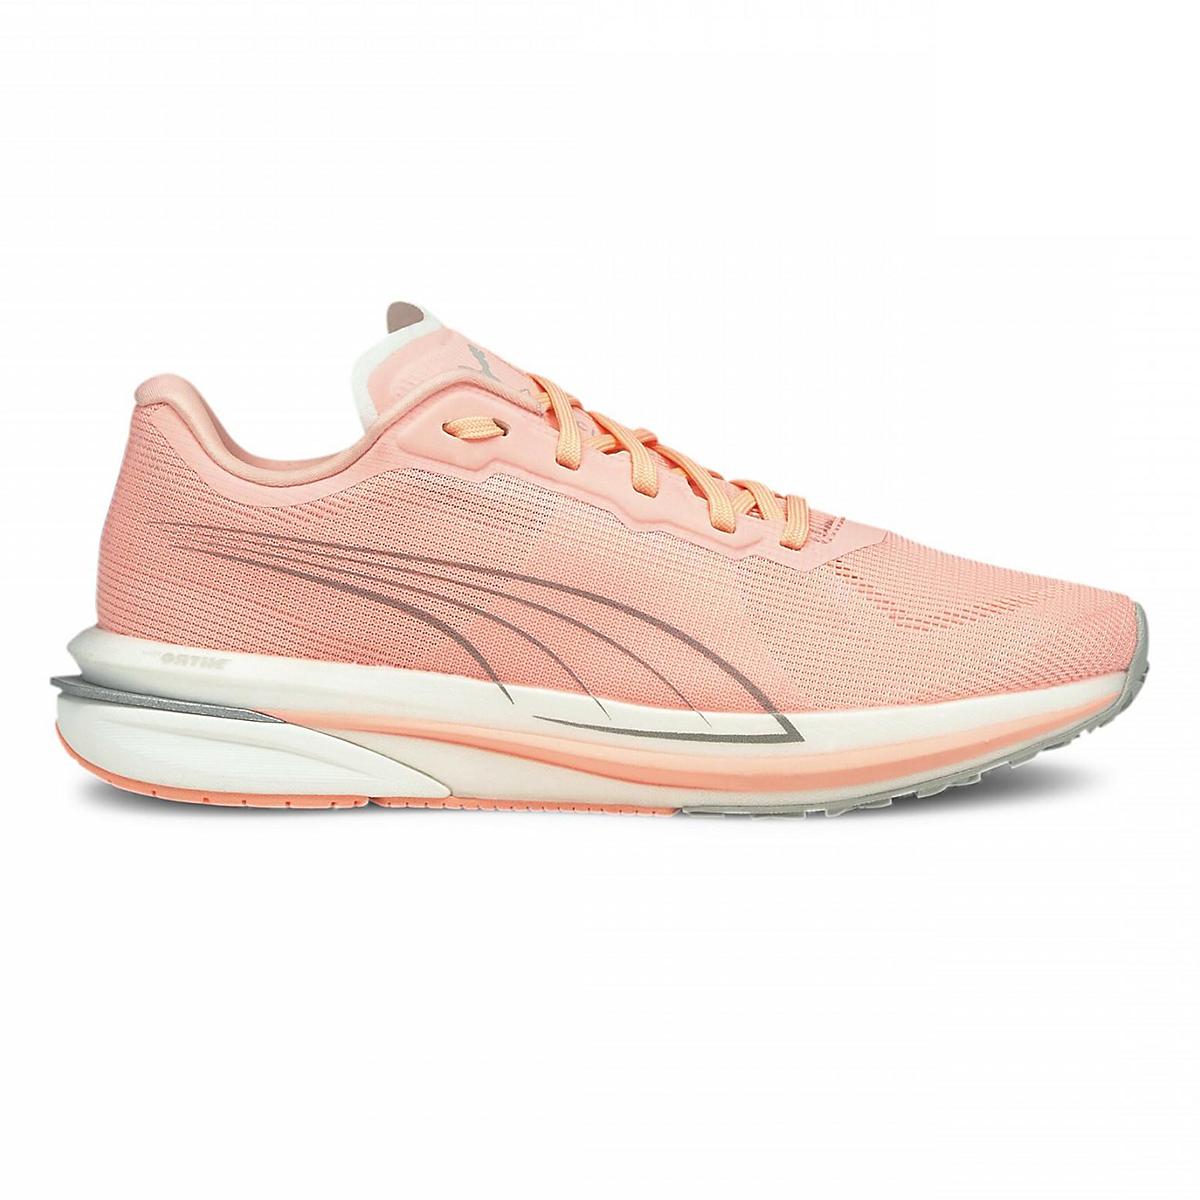 Women's Puma Velocity Nitro Running Shoe - Color: Elektro Peach-Puma Silver - Size: 5.5 - Width: Regular, Elektro Peach-Puma Silver, large, image 1